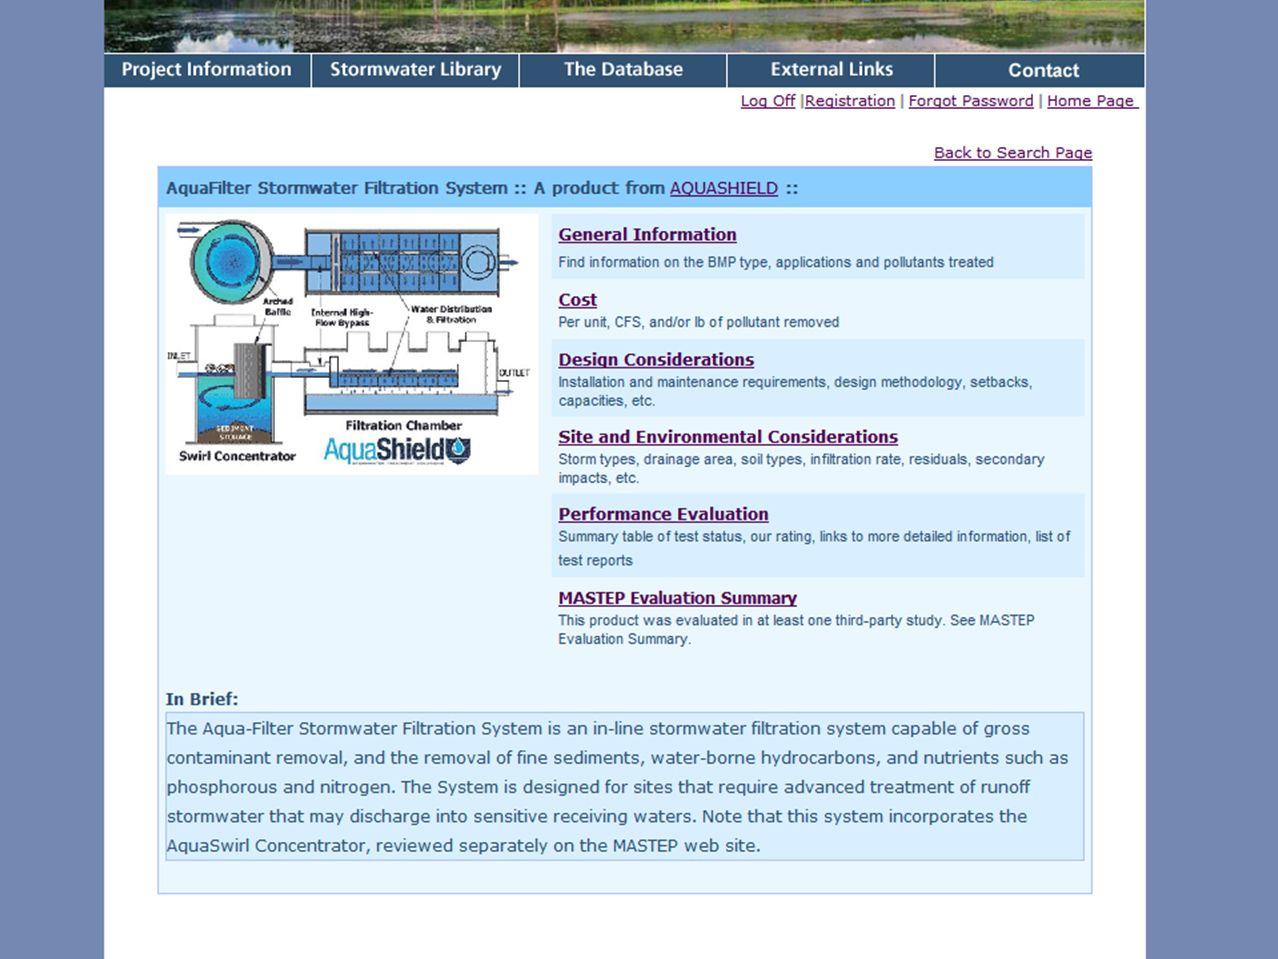 www.mastep.net Massachusetts Stormwater Technology Evaluation Project, UMass